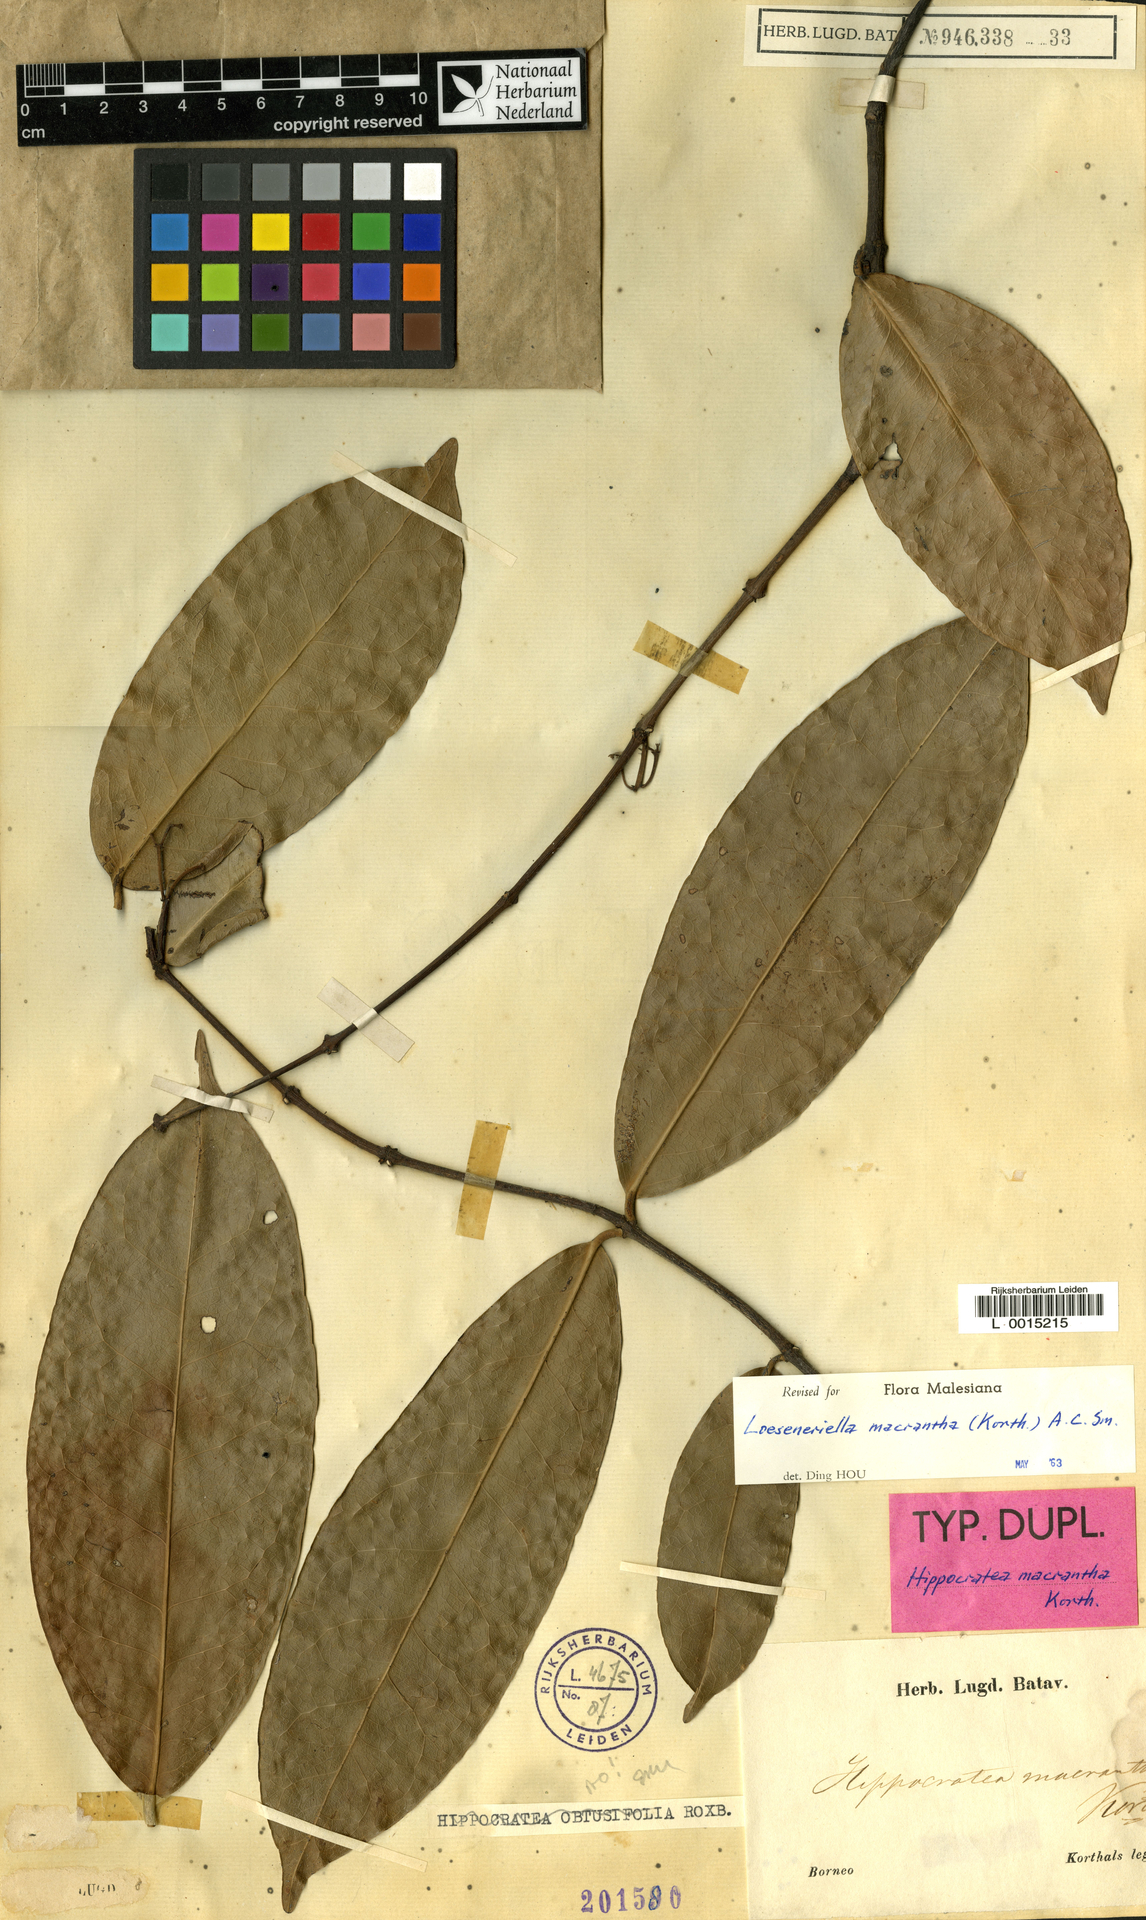 L  0015215 | Loeseneriella macrantha (Korth.) A.C.Sm.